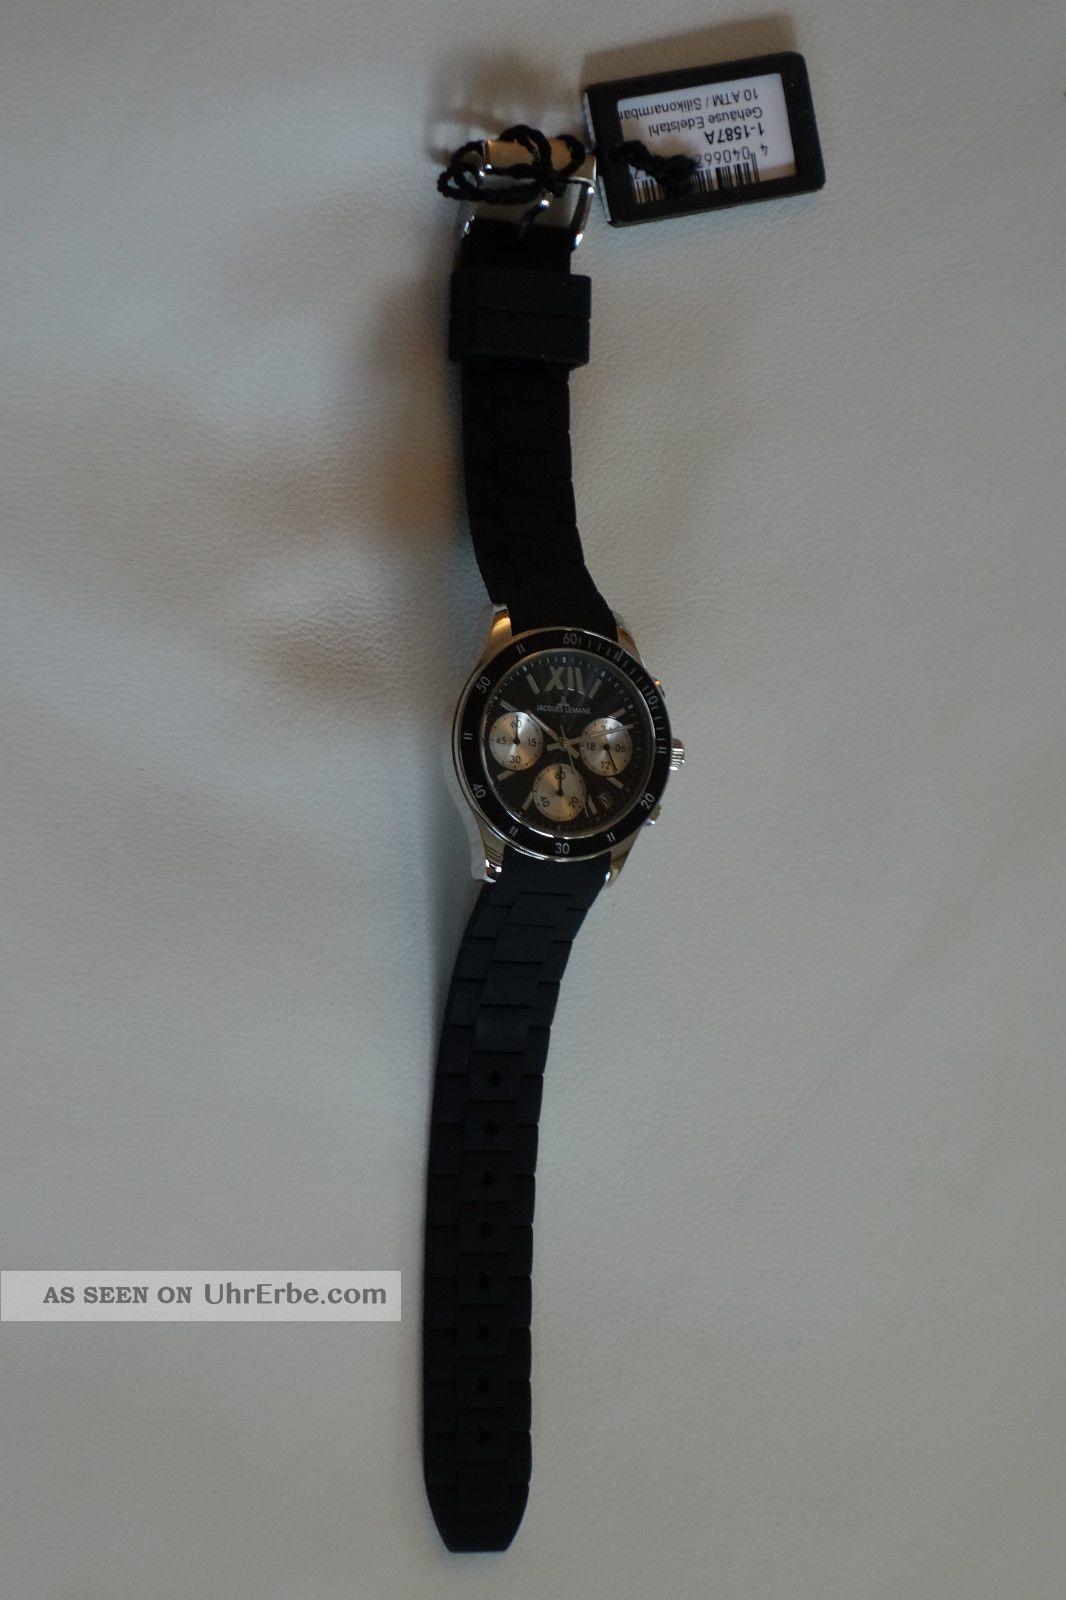 Jacques Lemans Damenarmbanduhr,  1 - 1587a, . Armbanduhren Bild